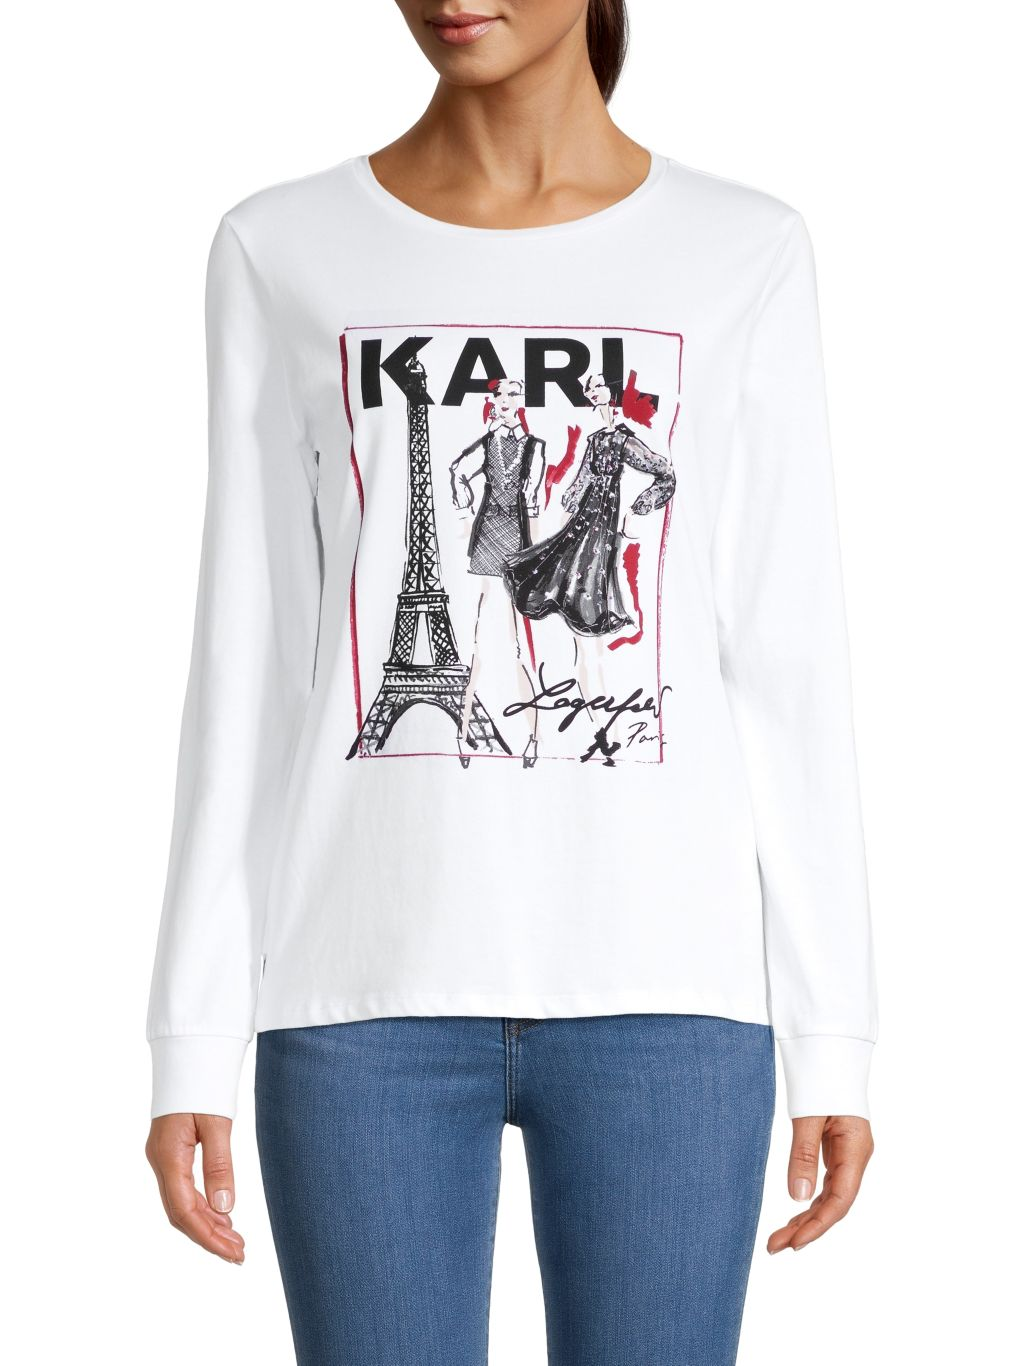 Karl Lagerfeld Paris Graphic Stretch-Cotton Tee